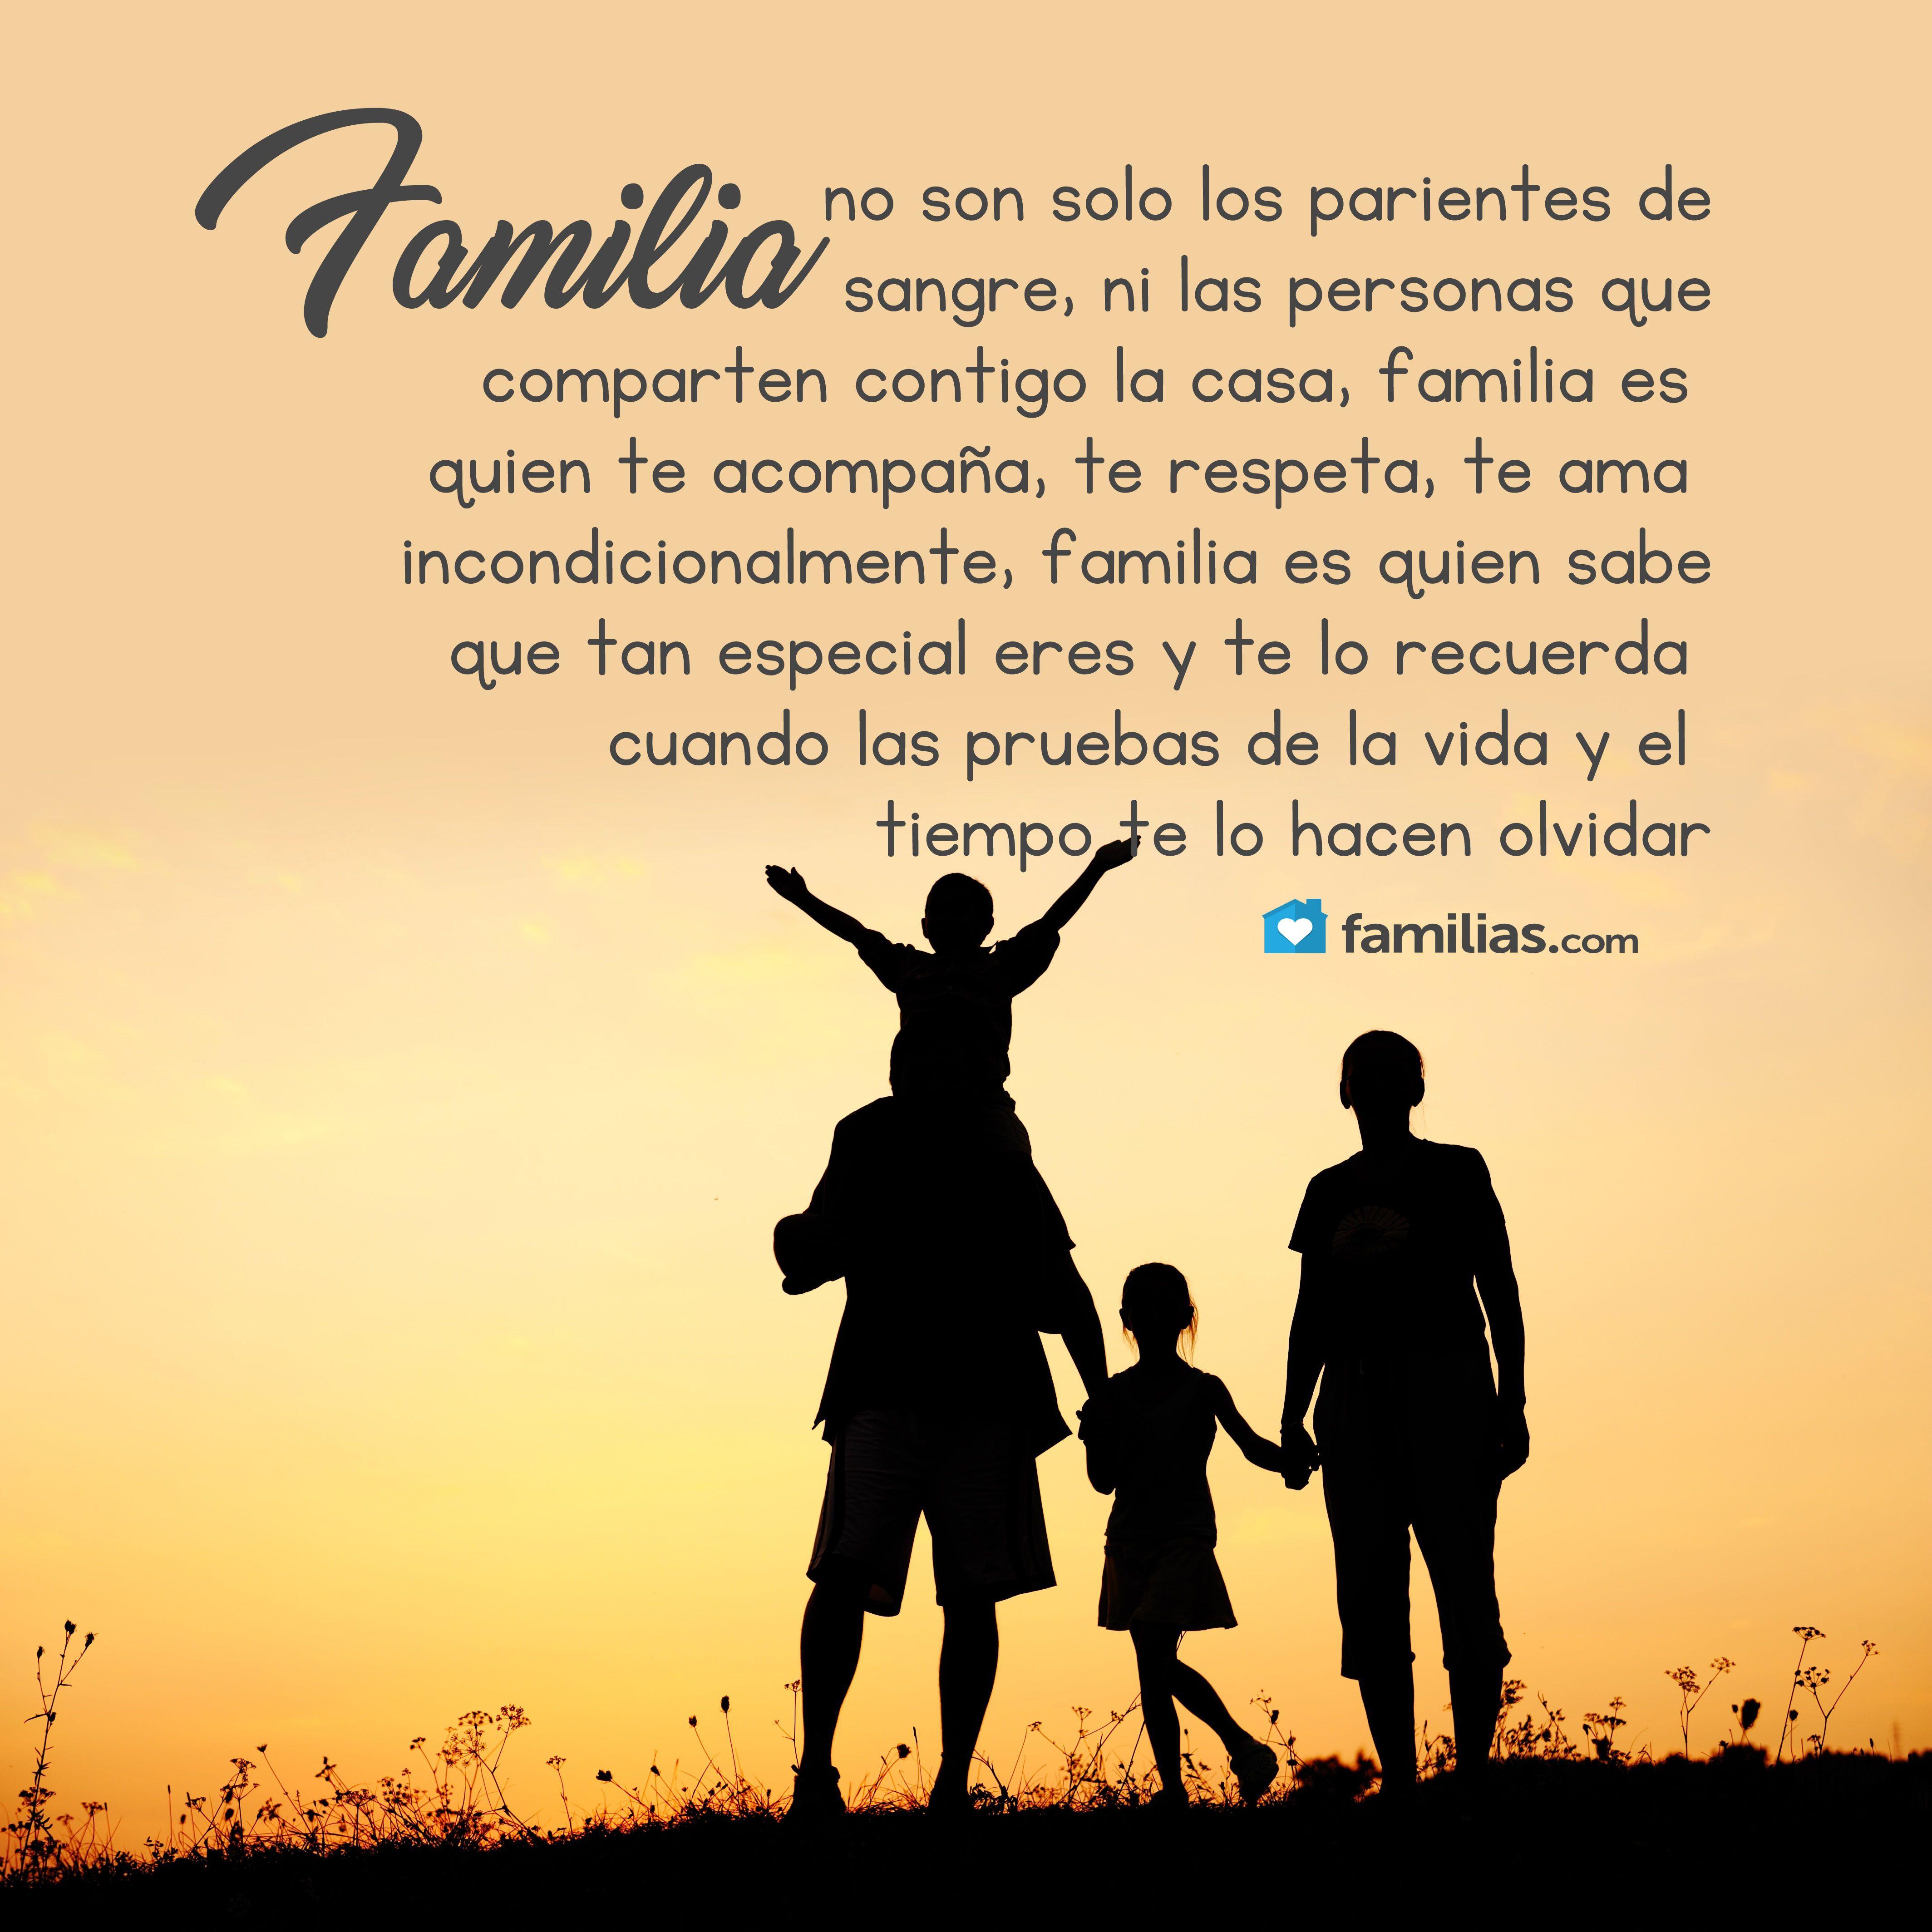 Frases De Amor Y Familia Yoamoamifamilia Www Familias Com Movie Posters Memes Movies